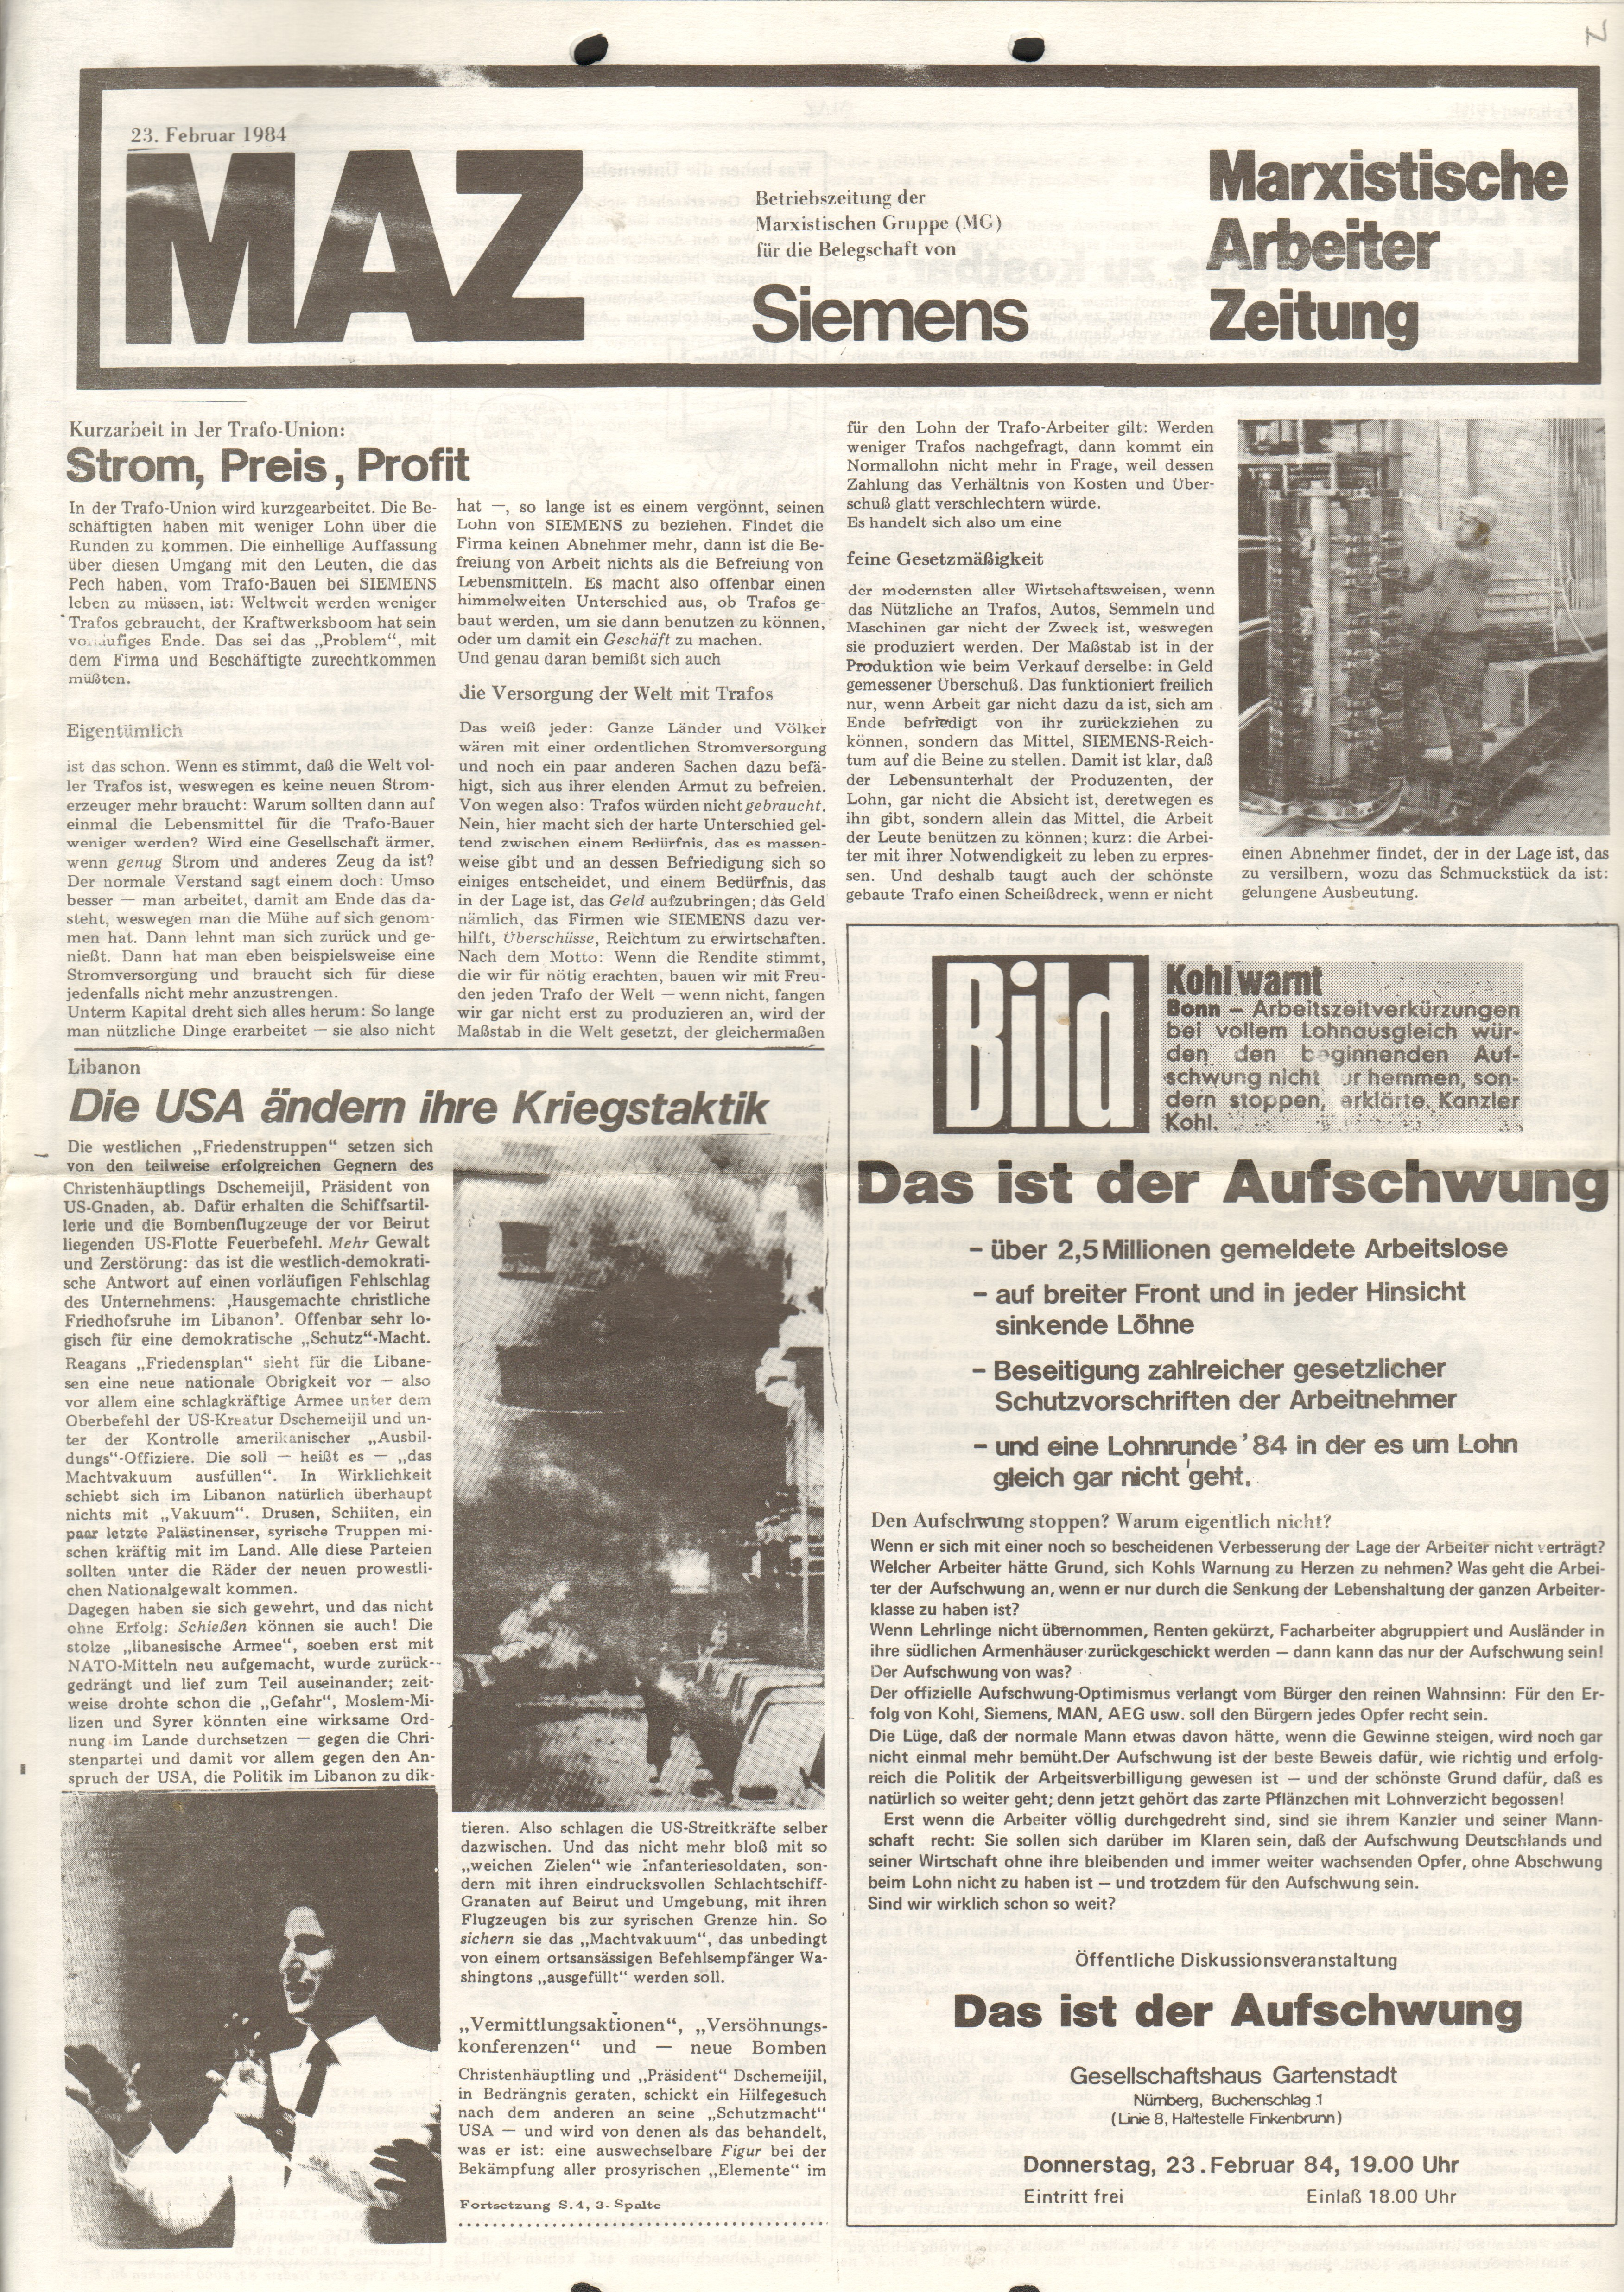 Nuernberg_MG_MAZ_Siemens_19840223_01